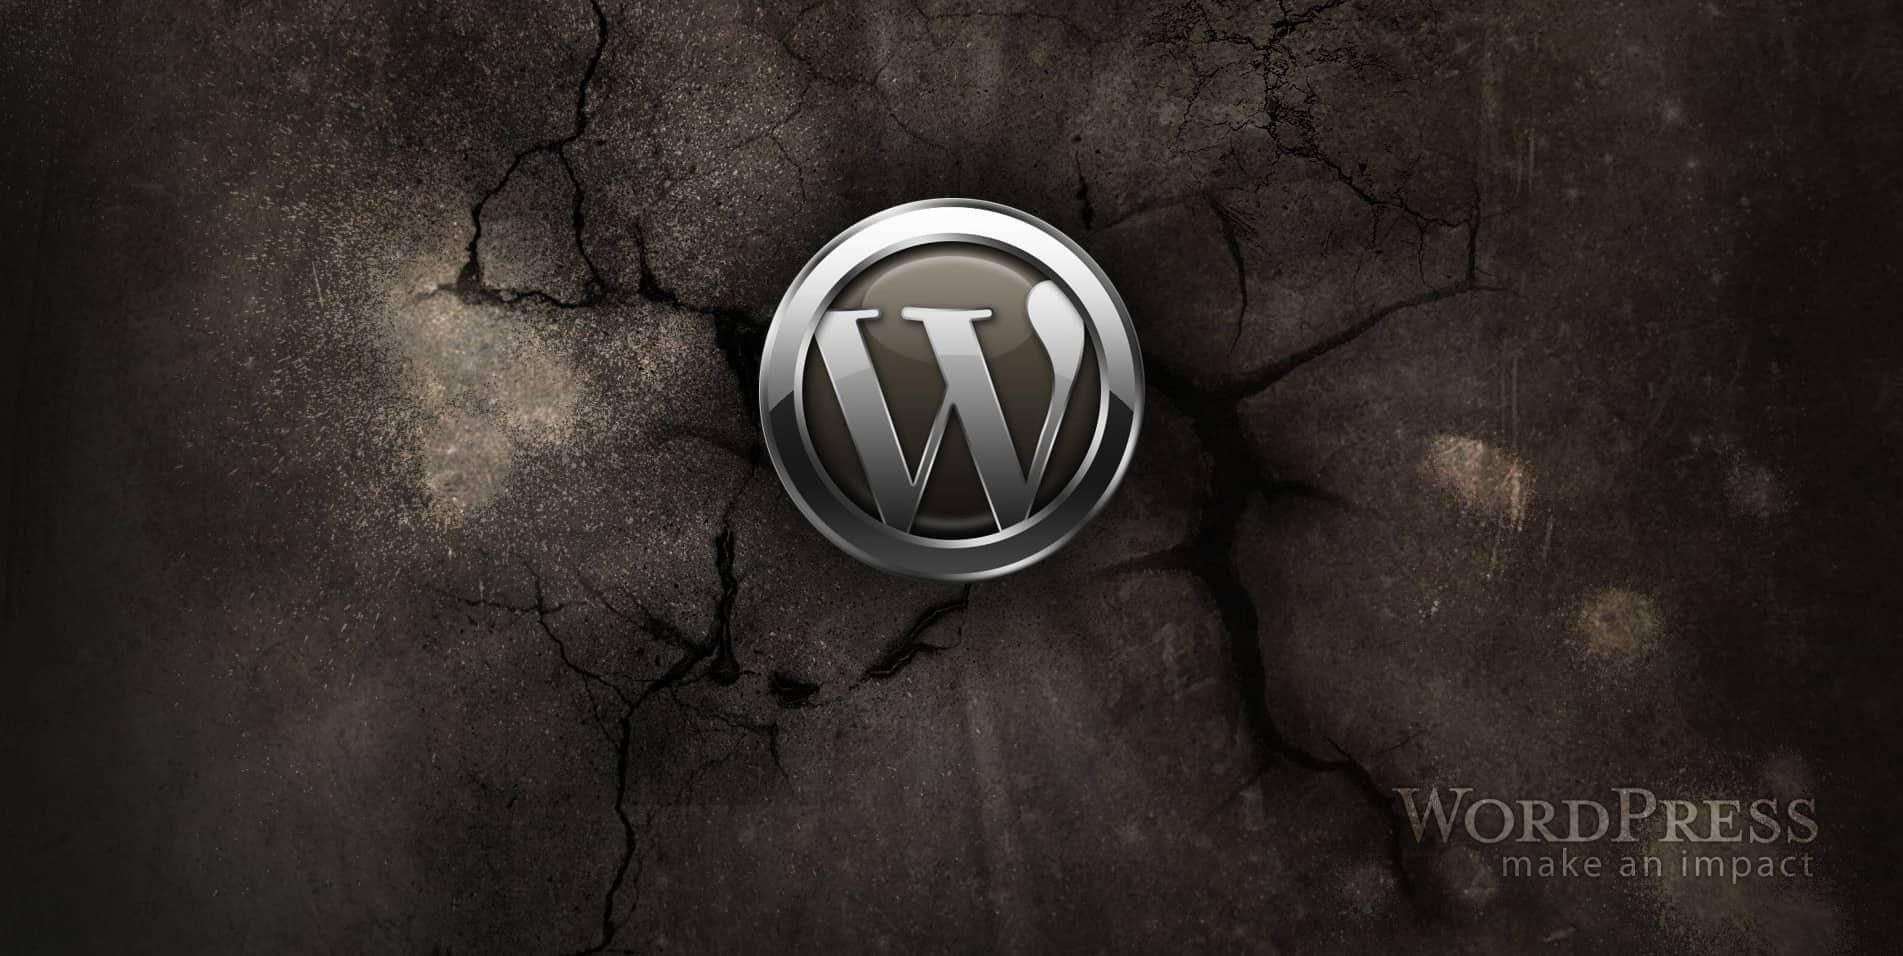 Why do we build websites on WordPress